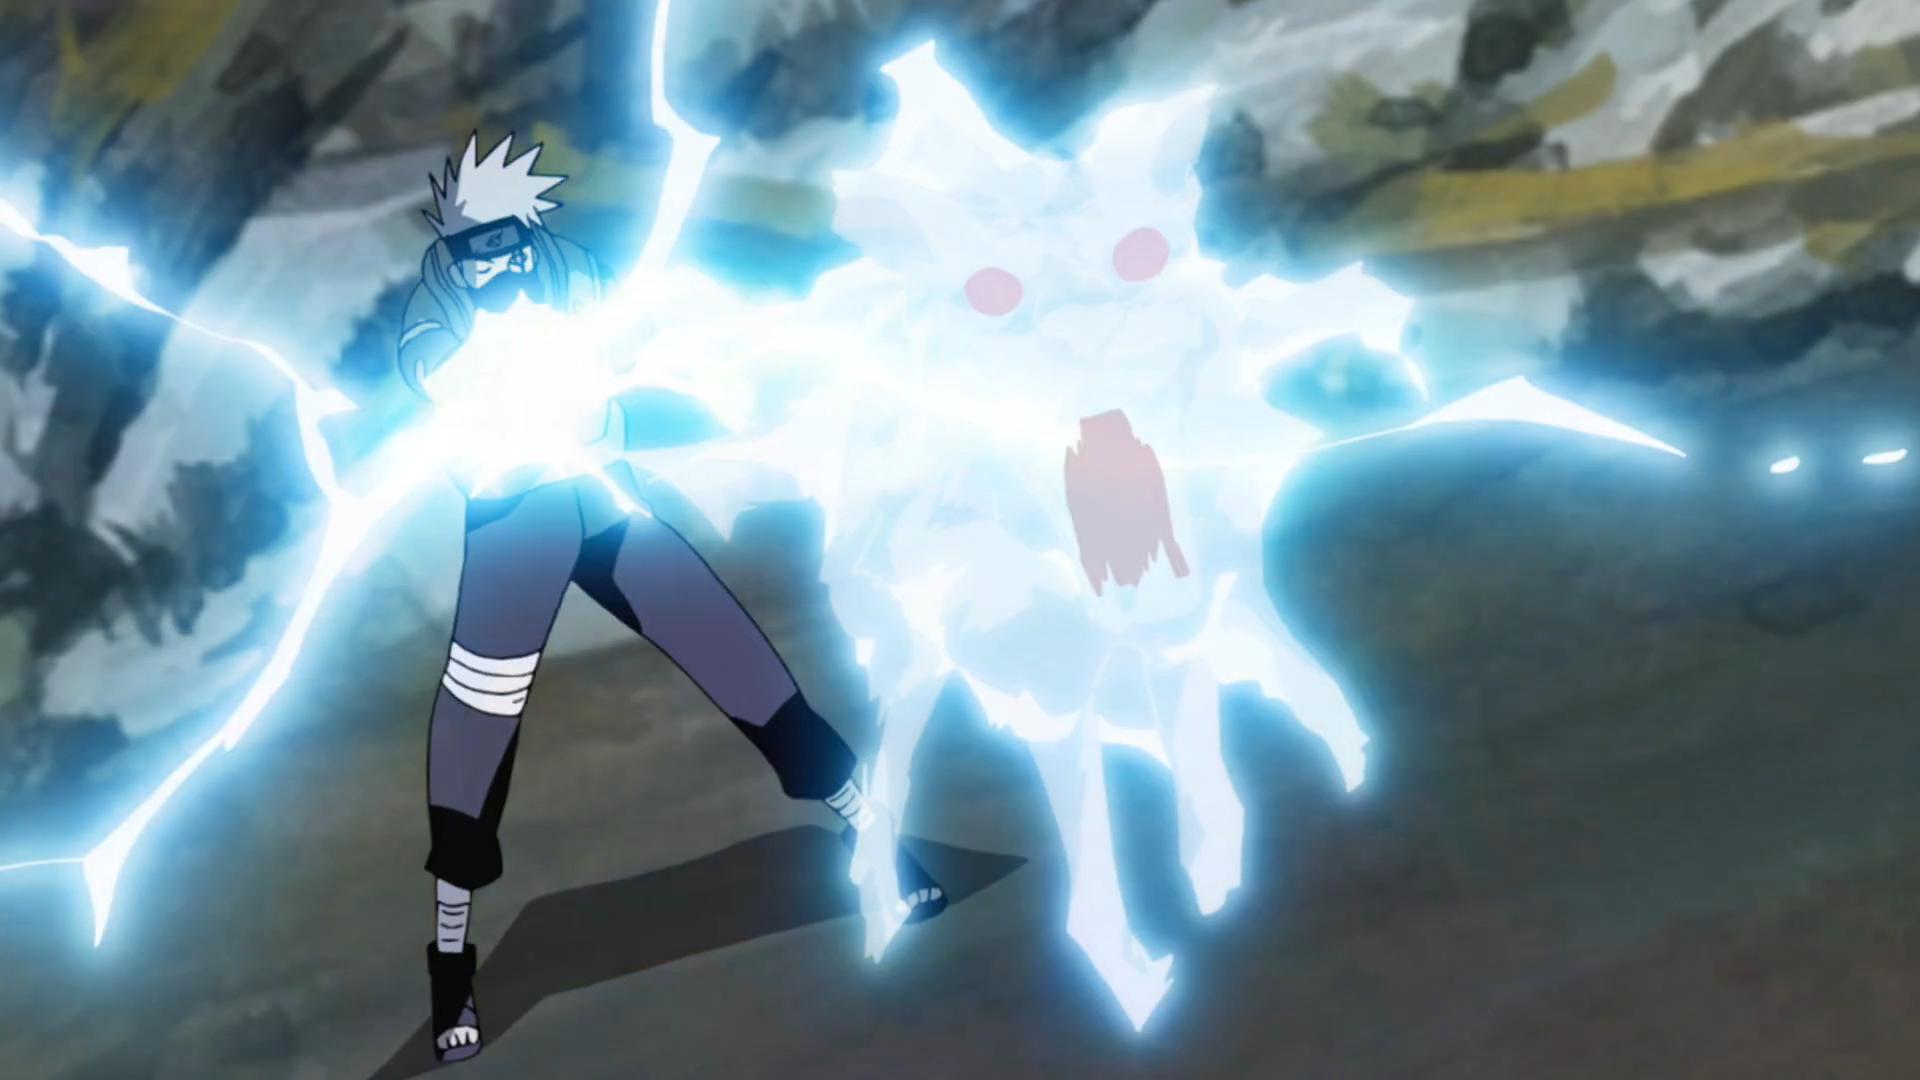 [Ficha: Kenshin] Hatake Kakashi LightningHound